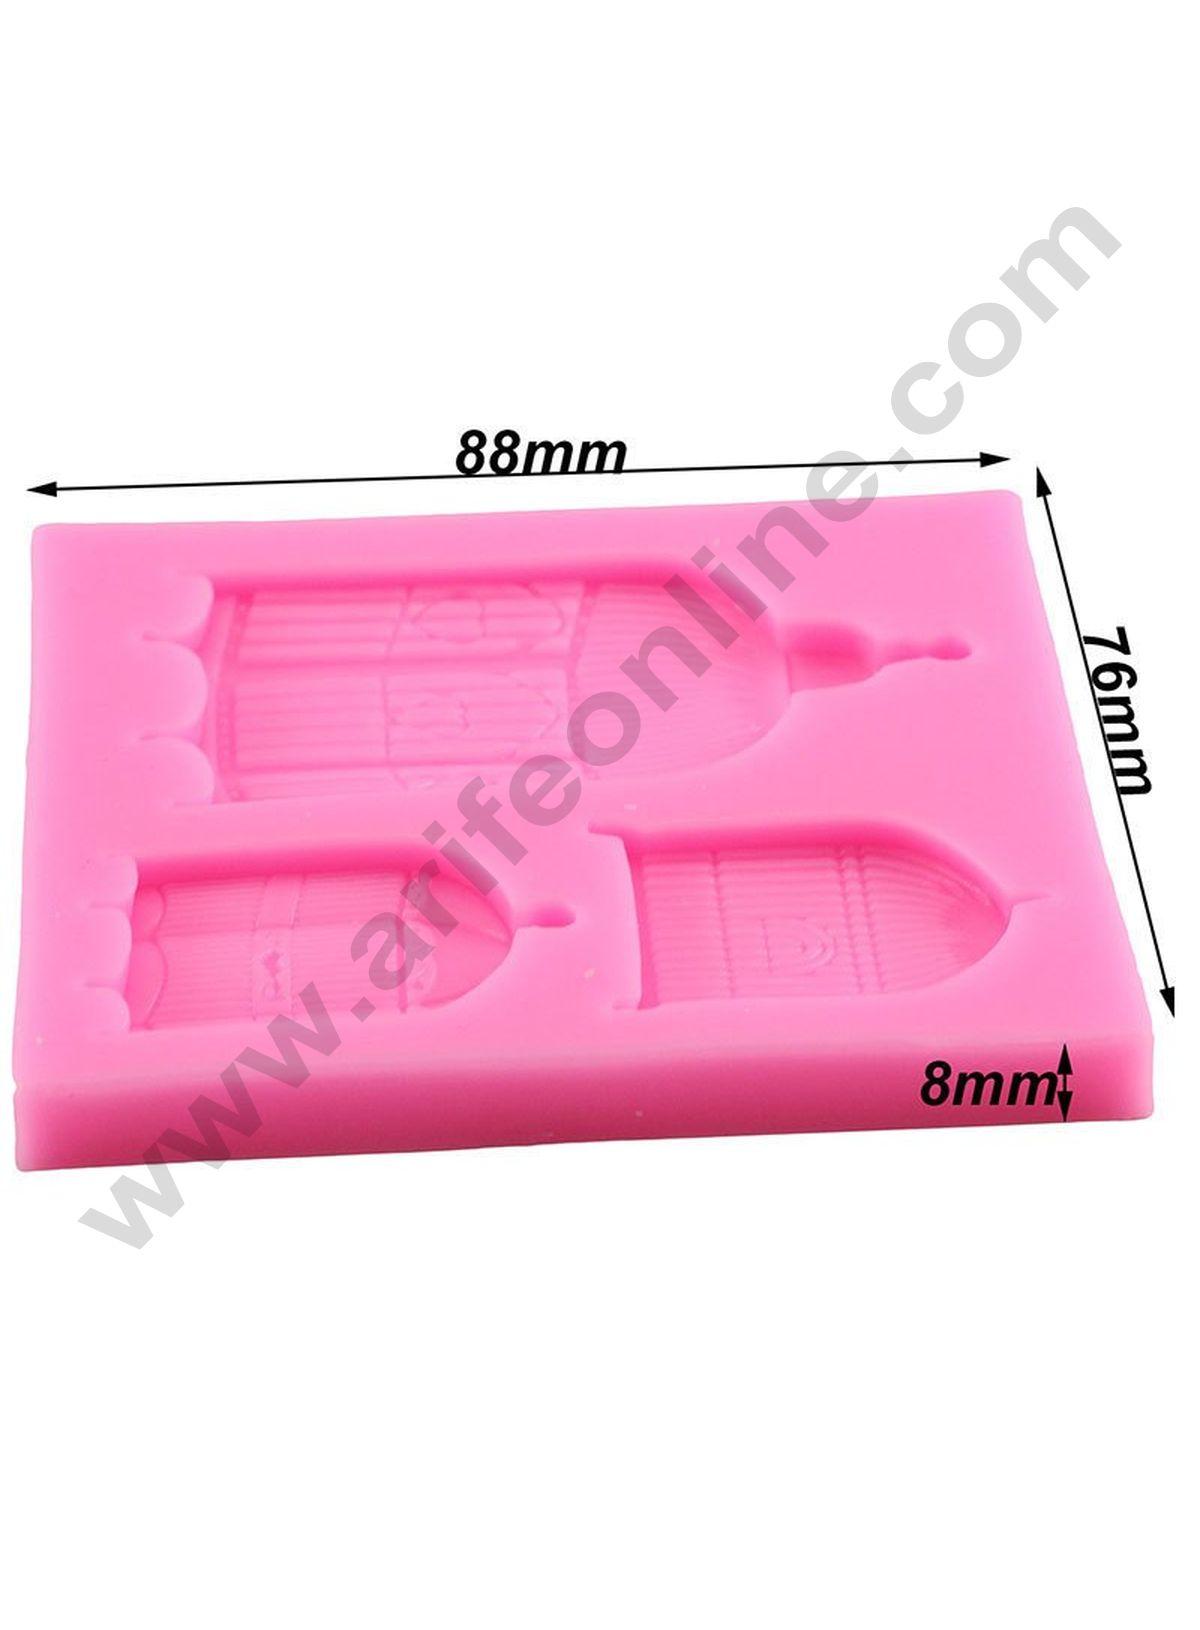 Alphabet 30 Cavity Silicone Mold for Fondant Gum Paste Chocolate Crafts NEW